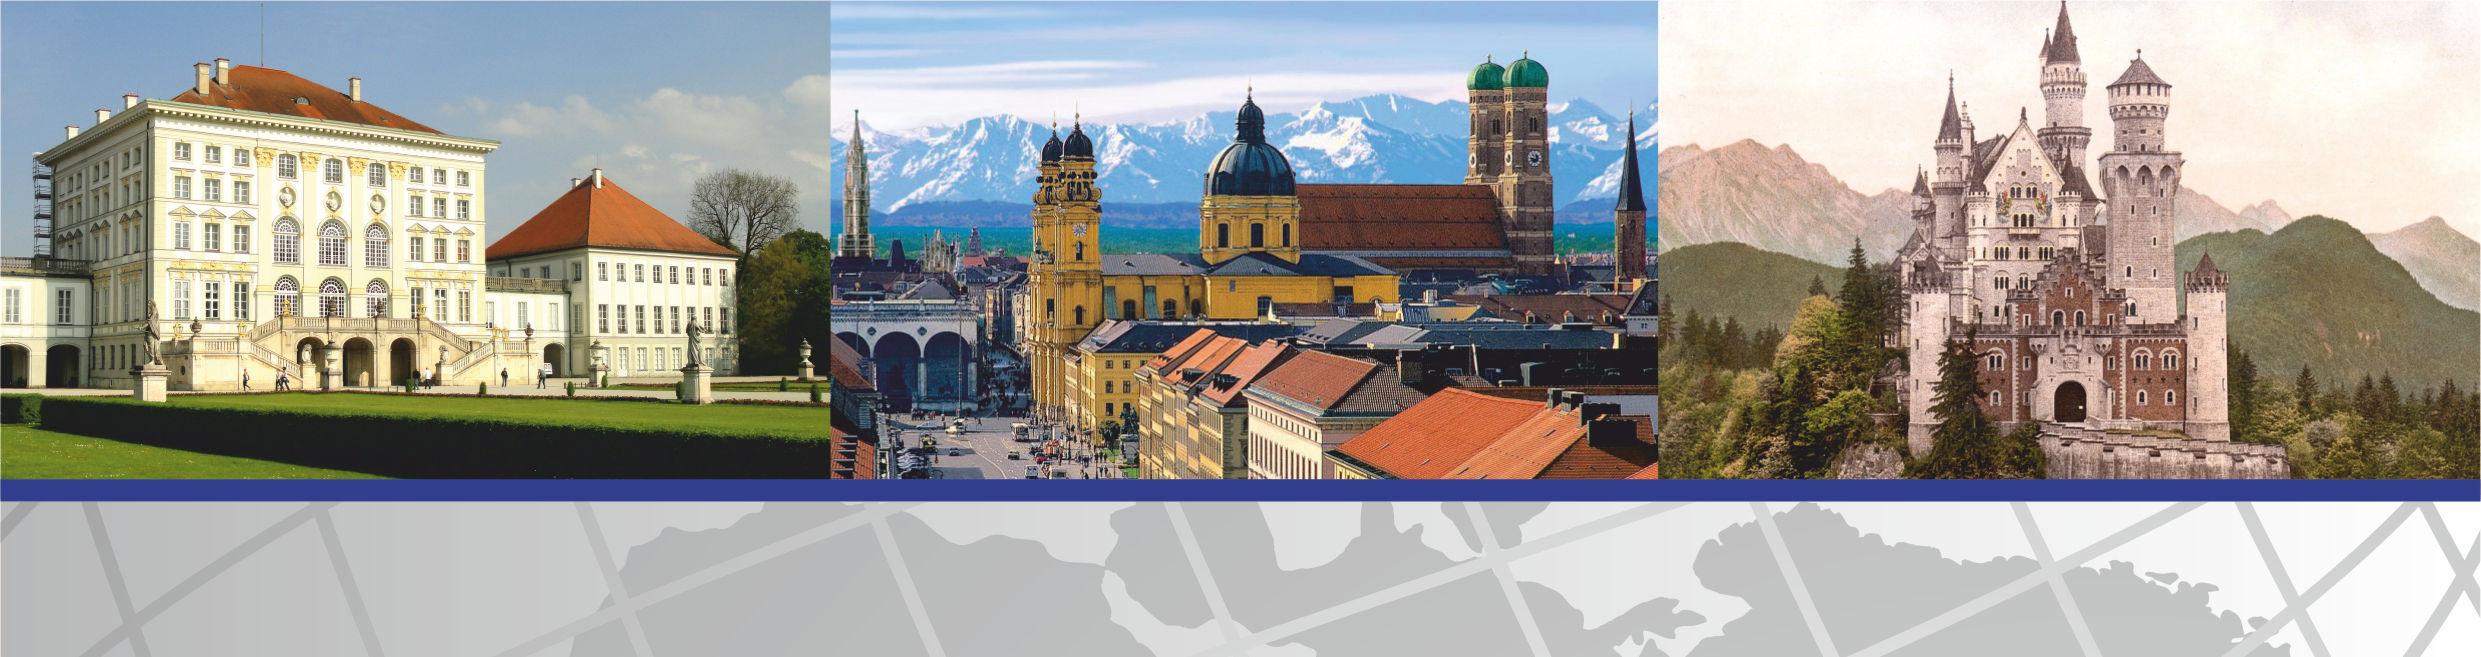 Tourist information about visiting Munich